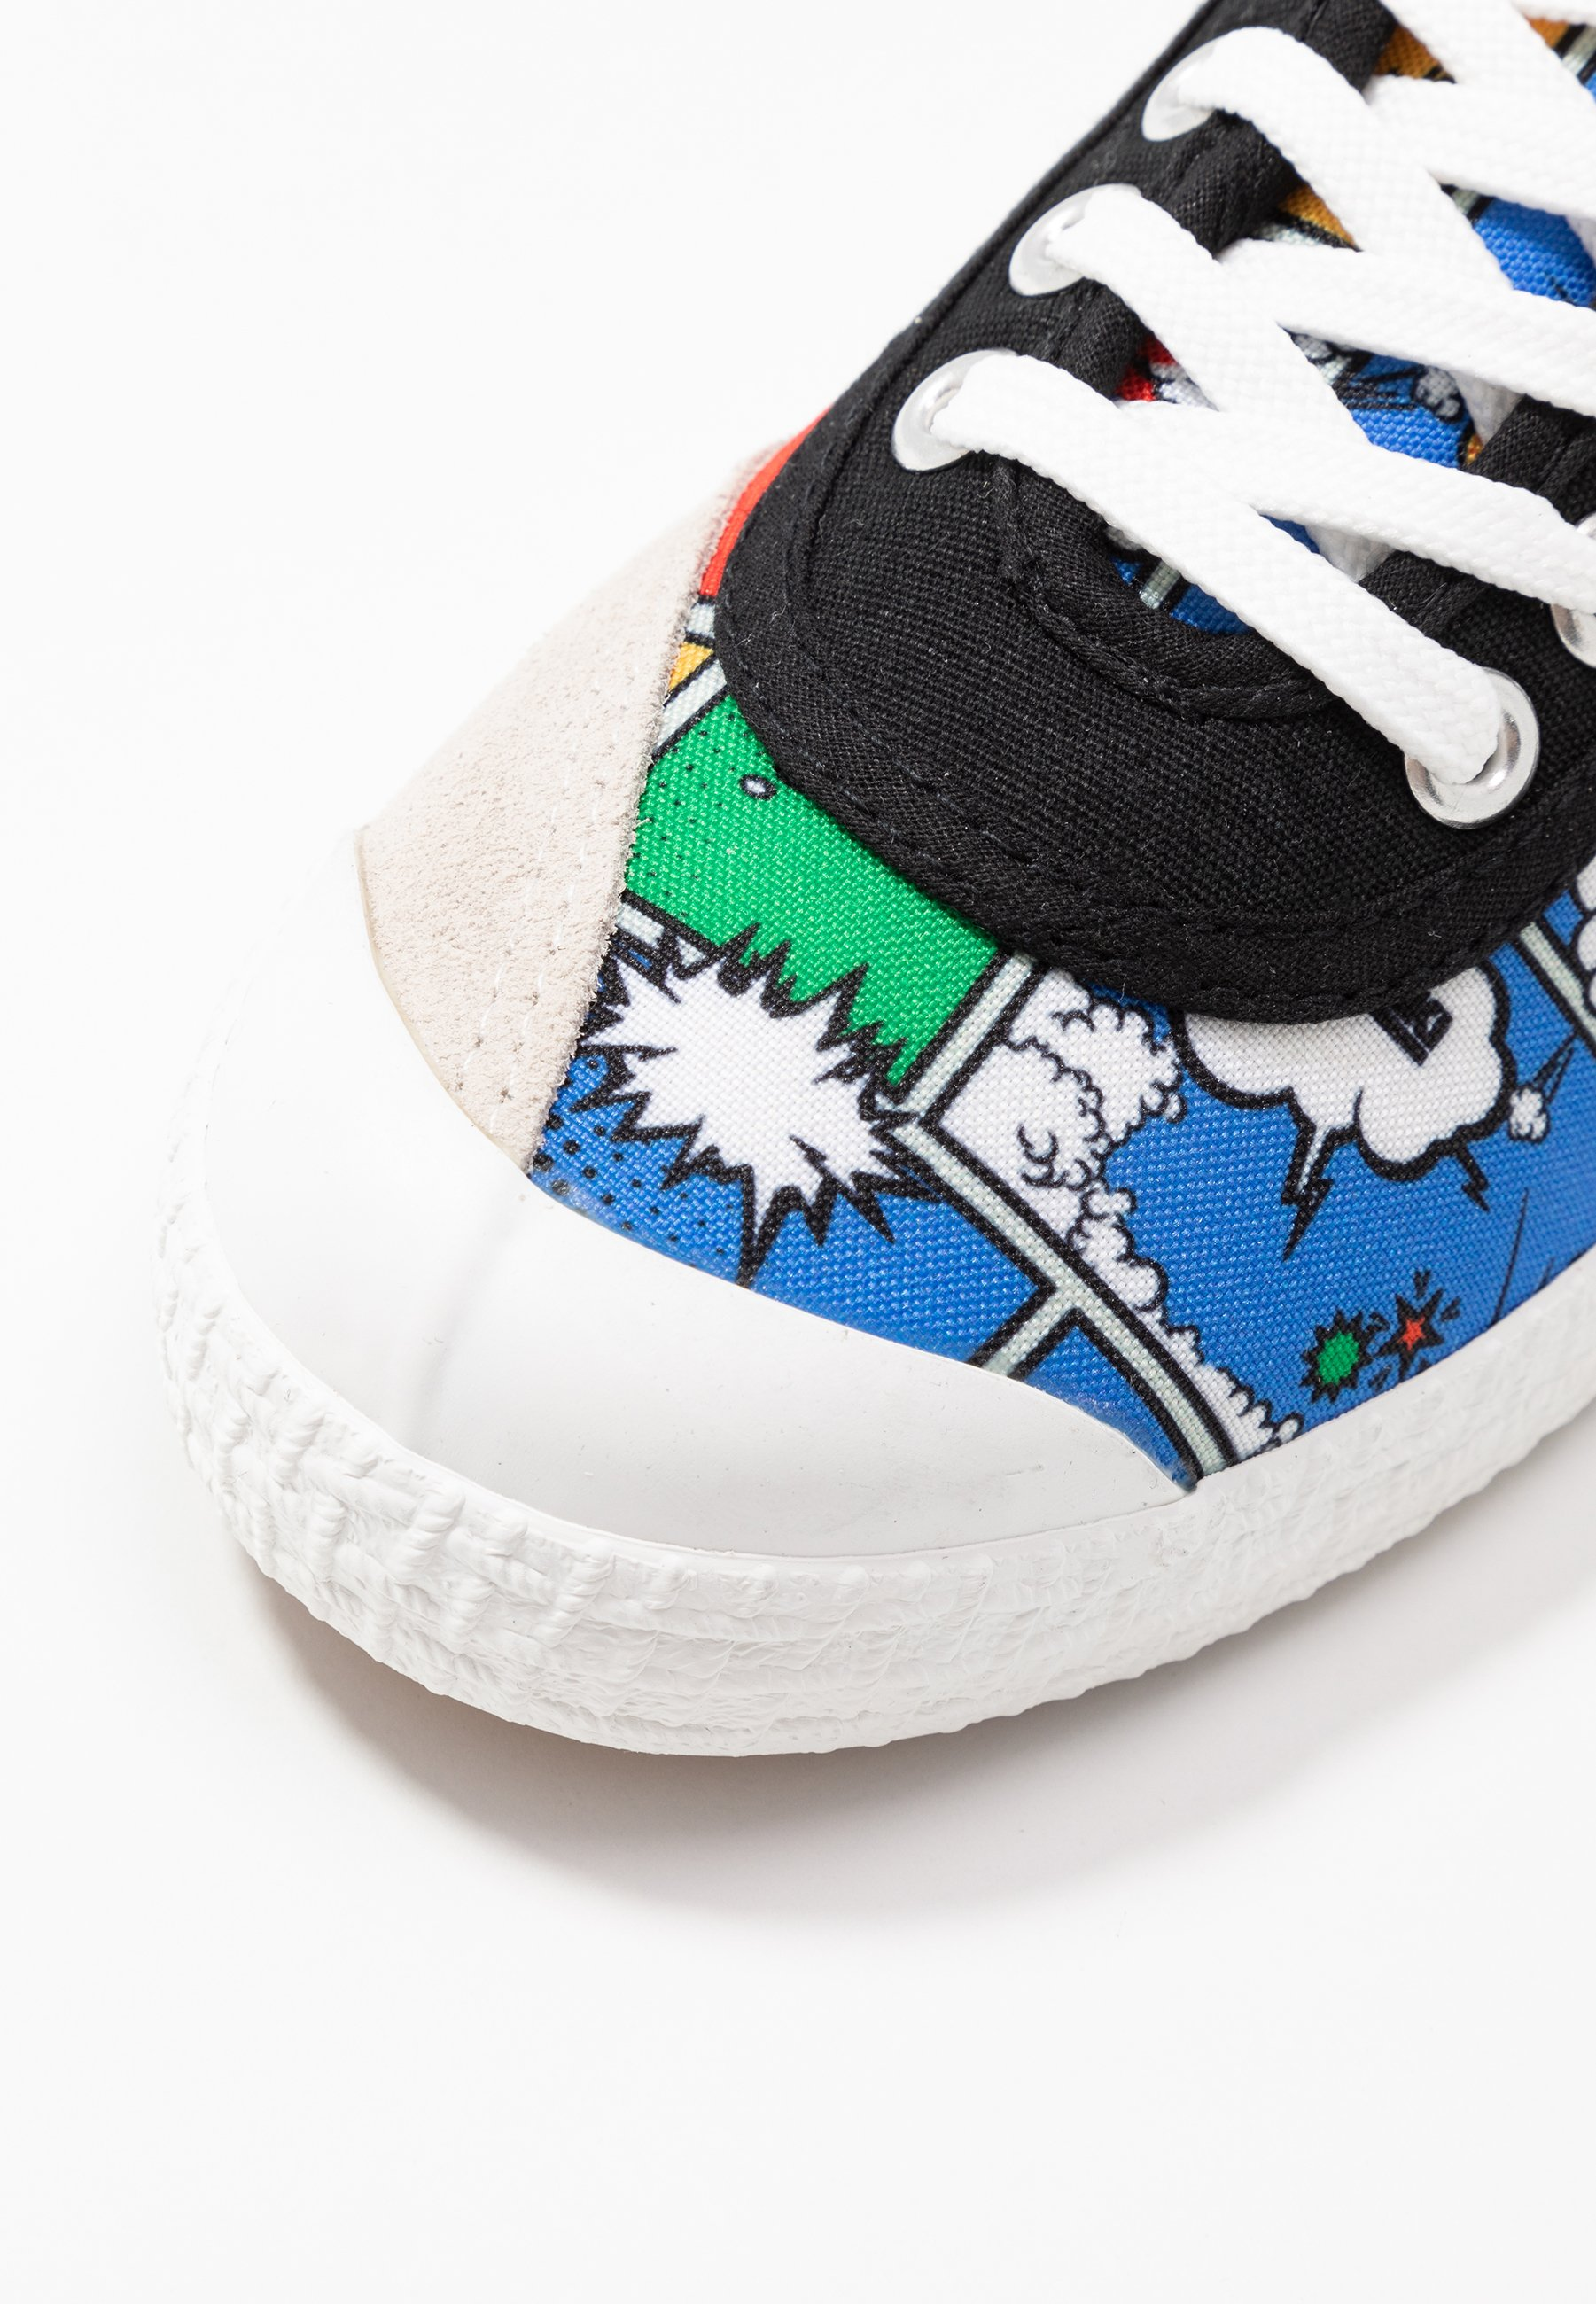 Kawasaki CARTOON SHOE - Baskets basses - multicolor - Sneakers femme Excellent